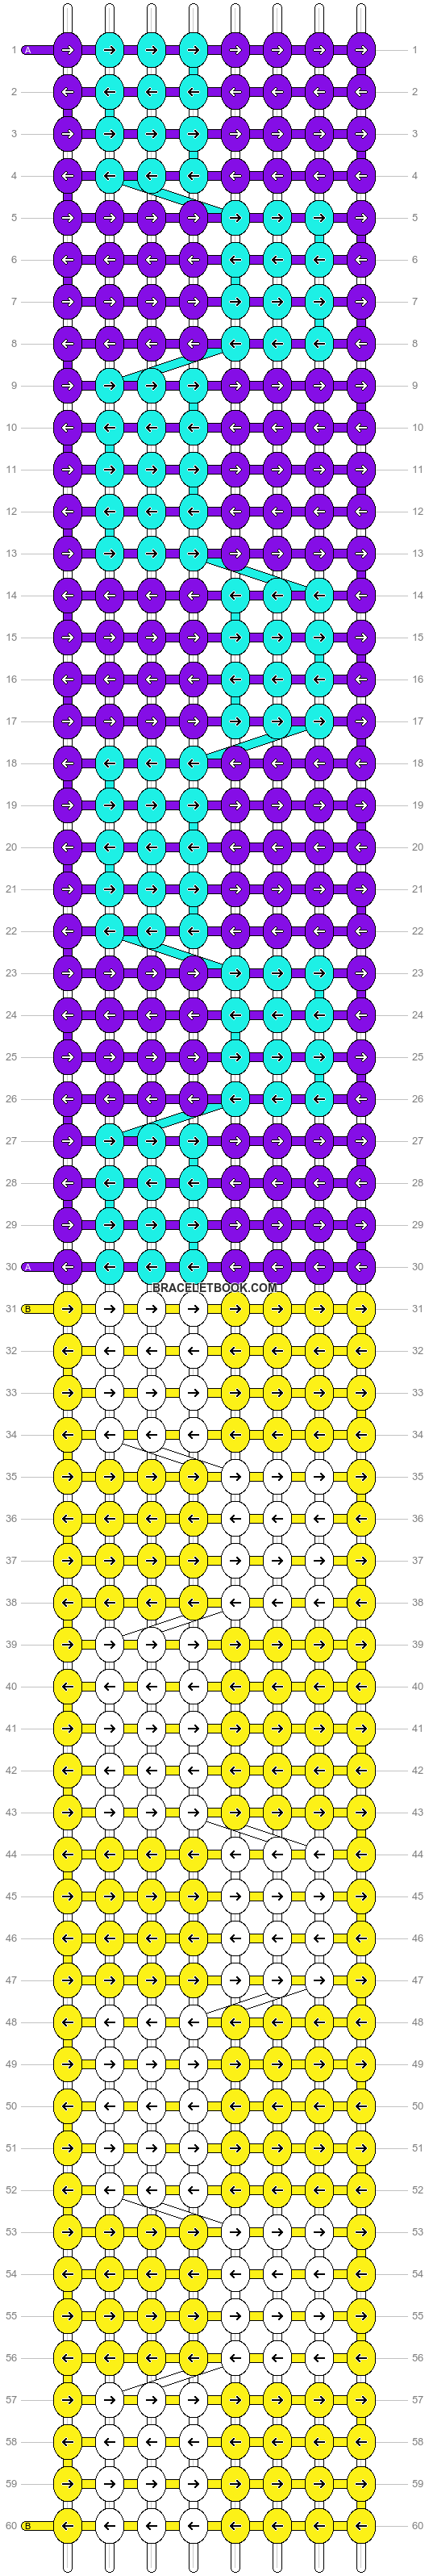 Alpha pattern #18027 pattern